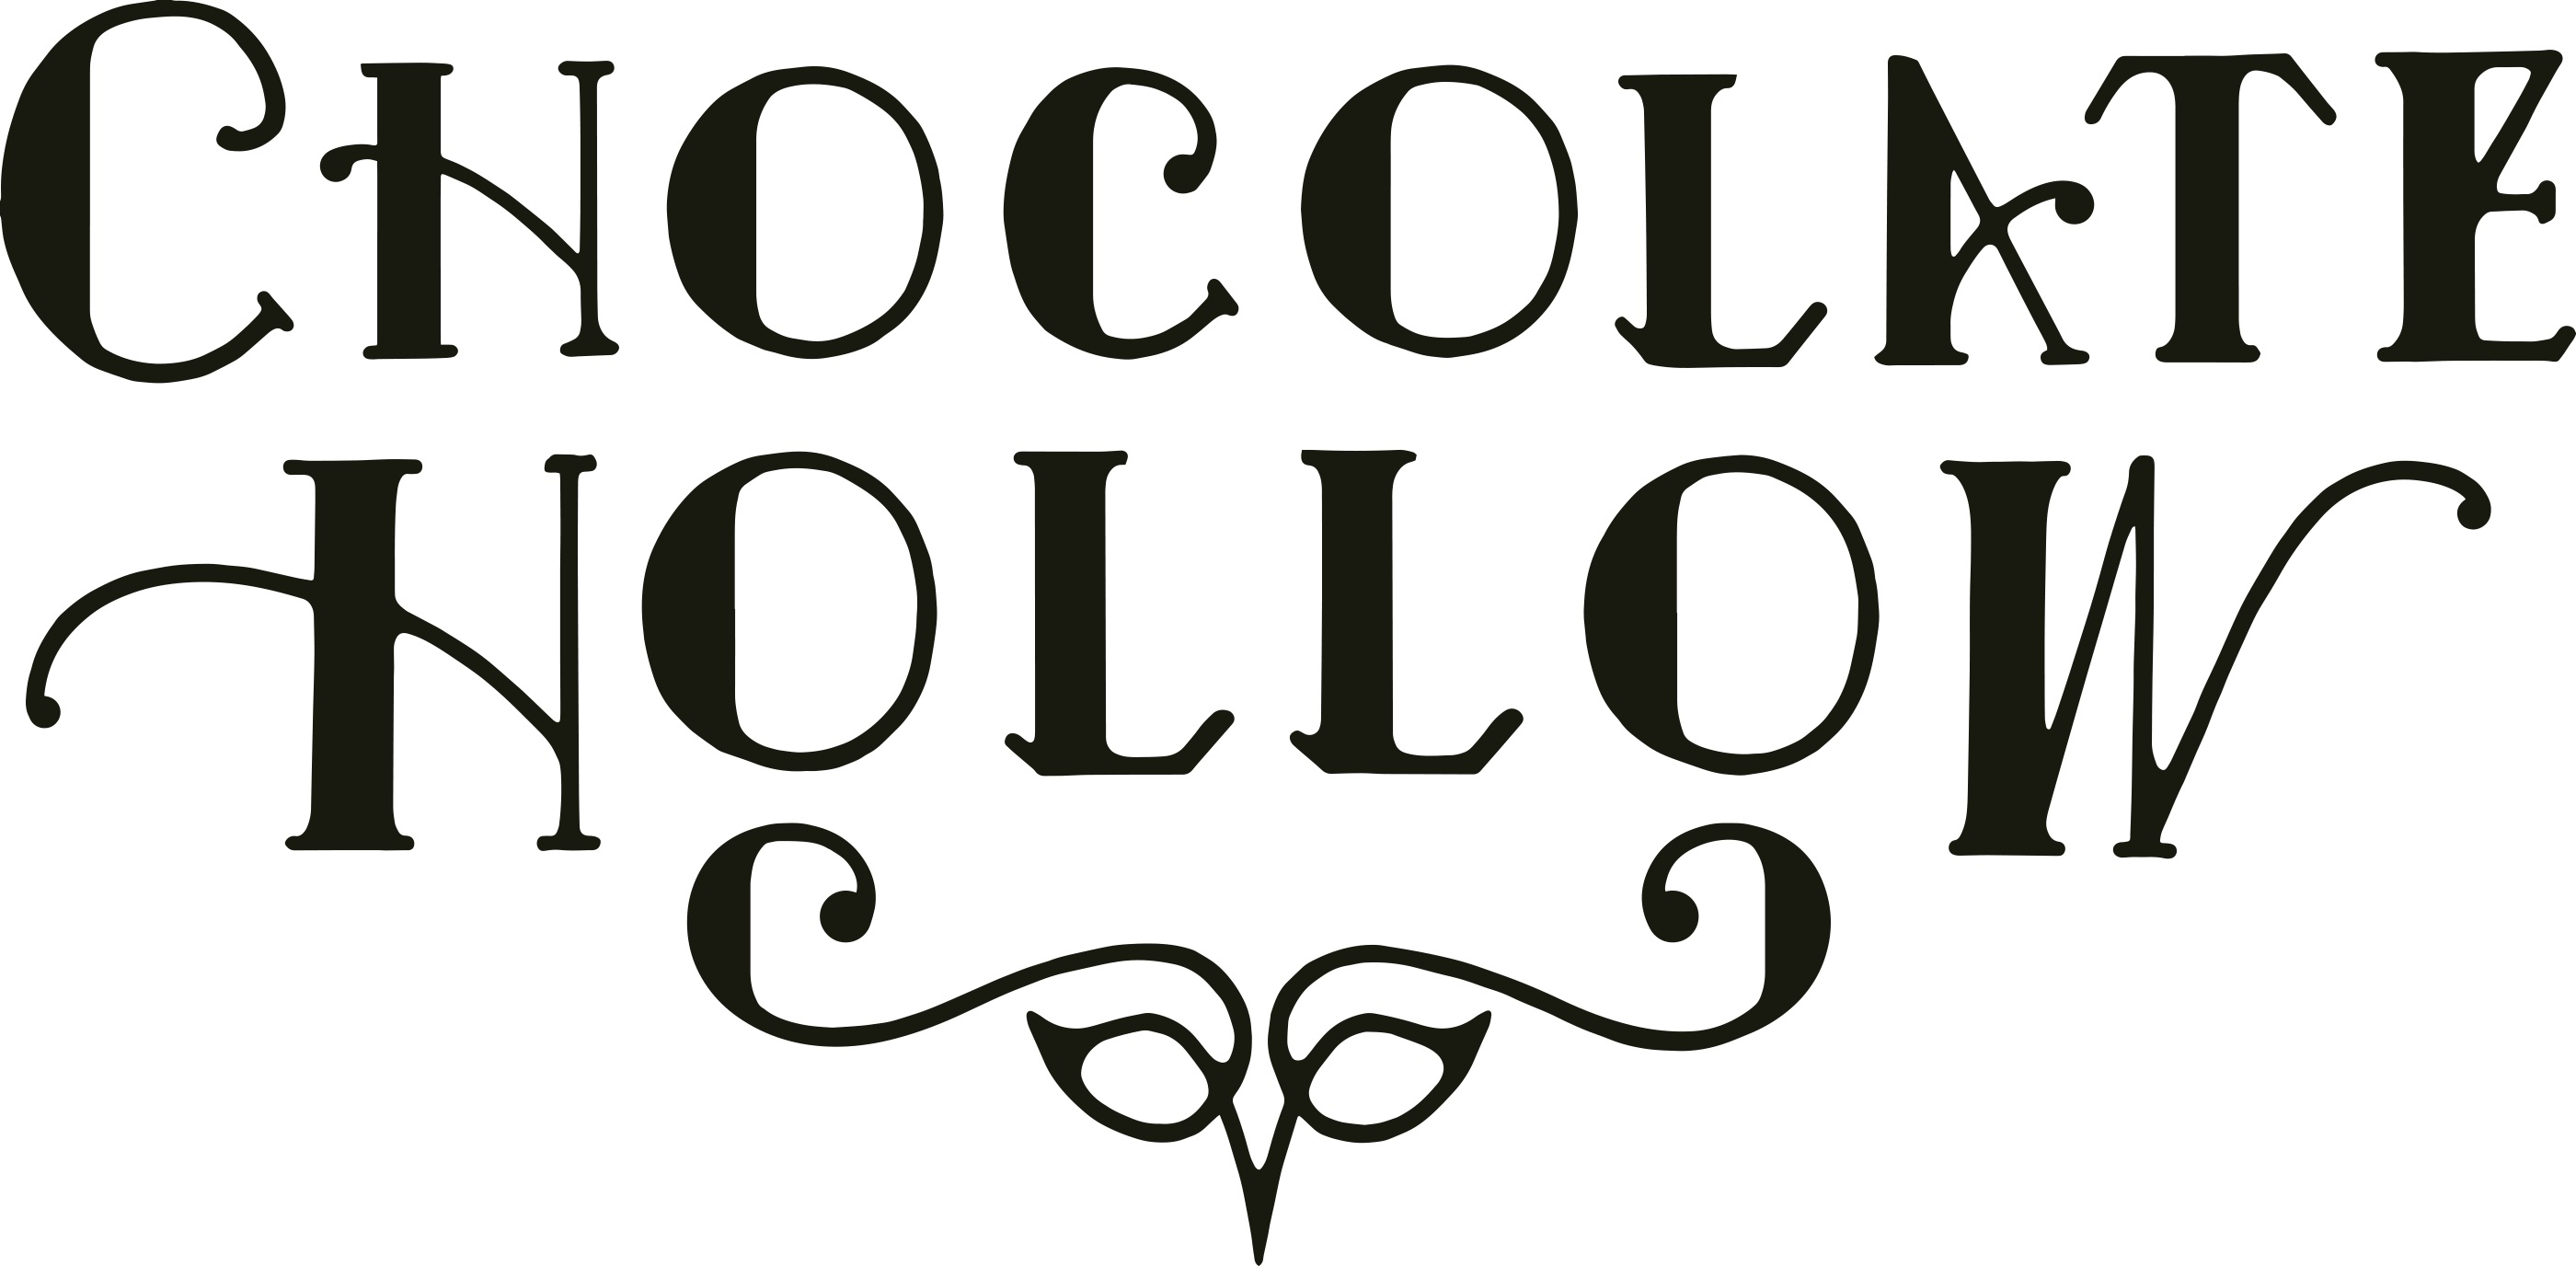 Chocolate Hollow